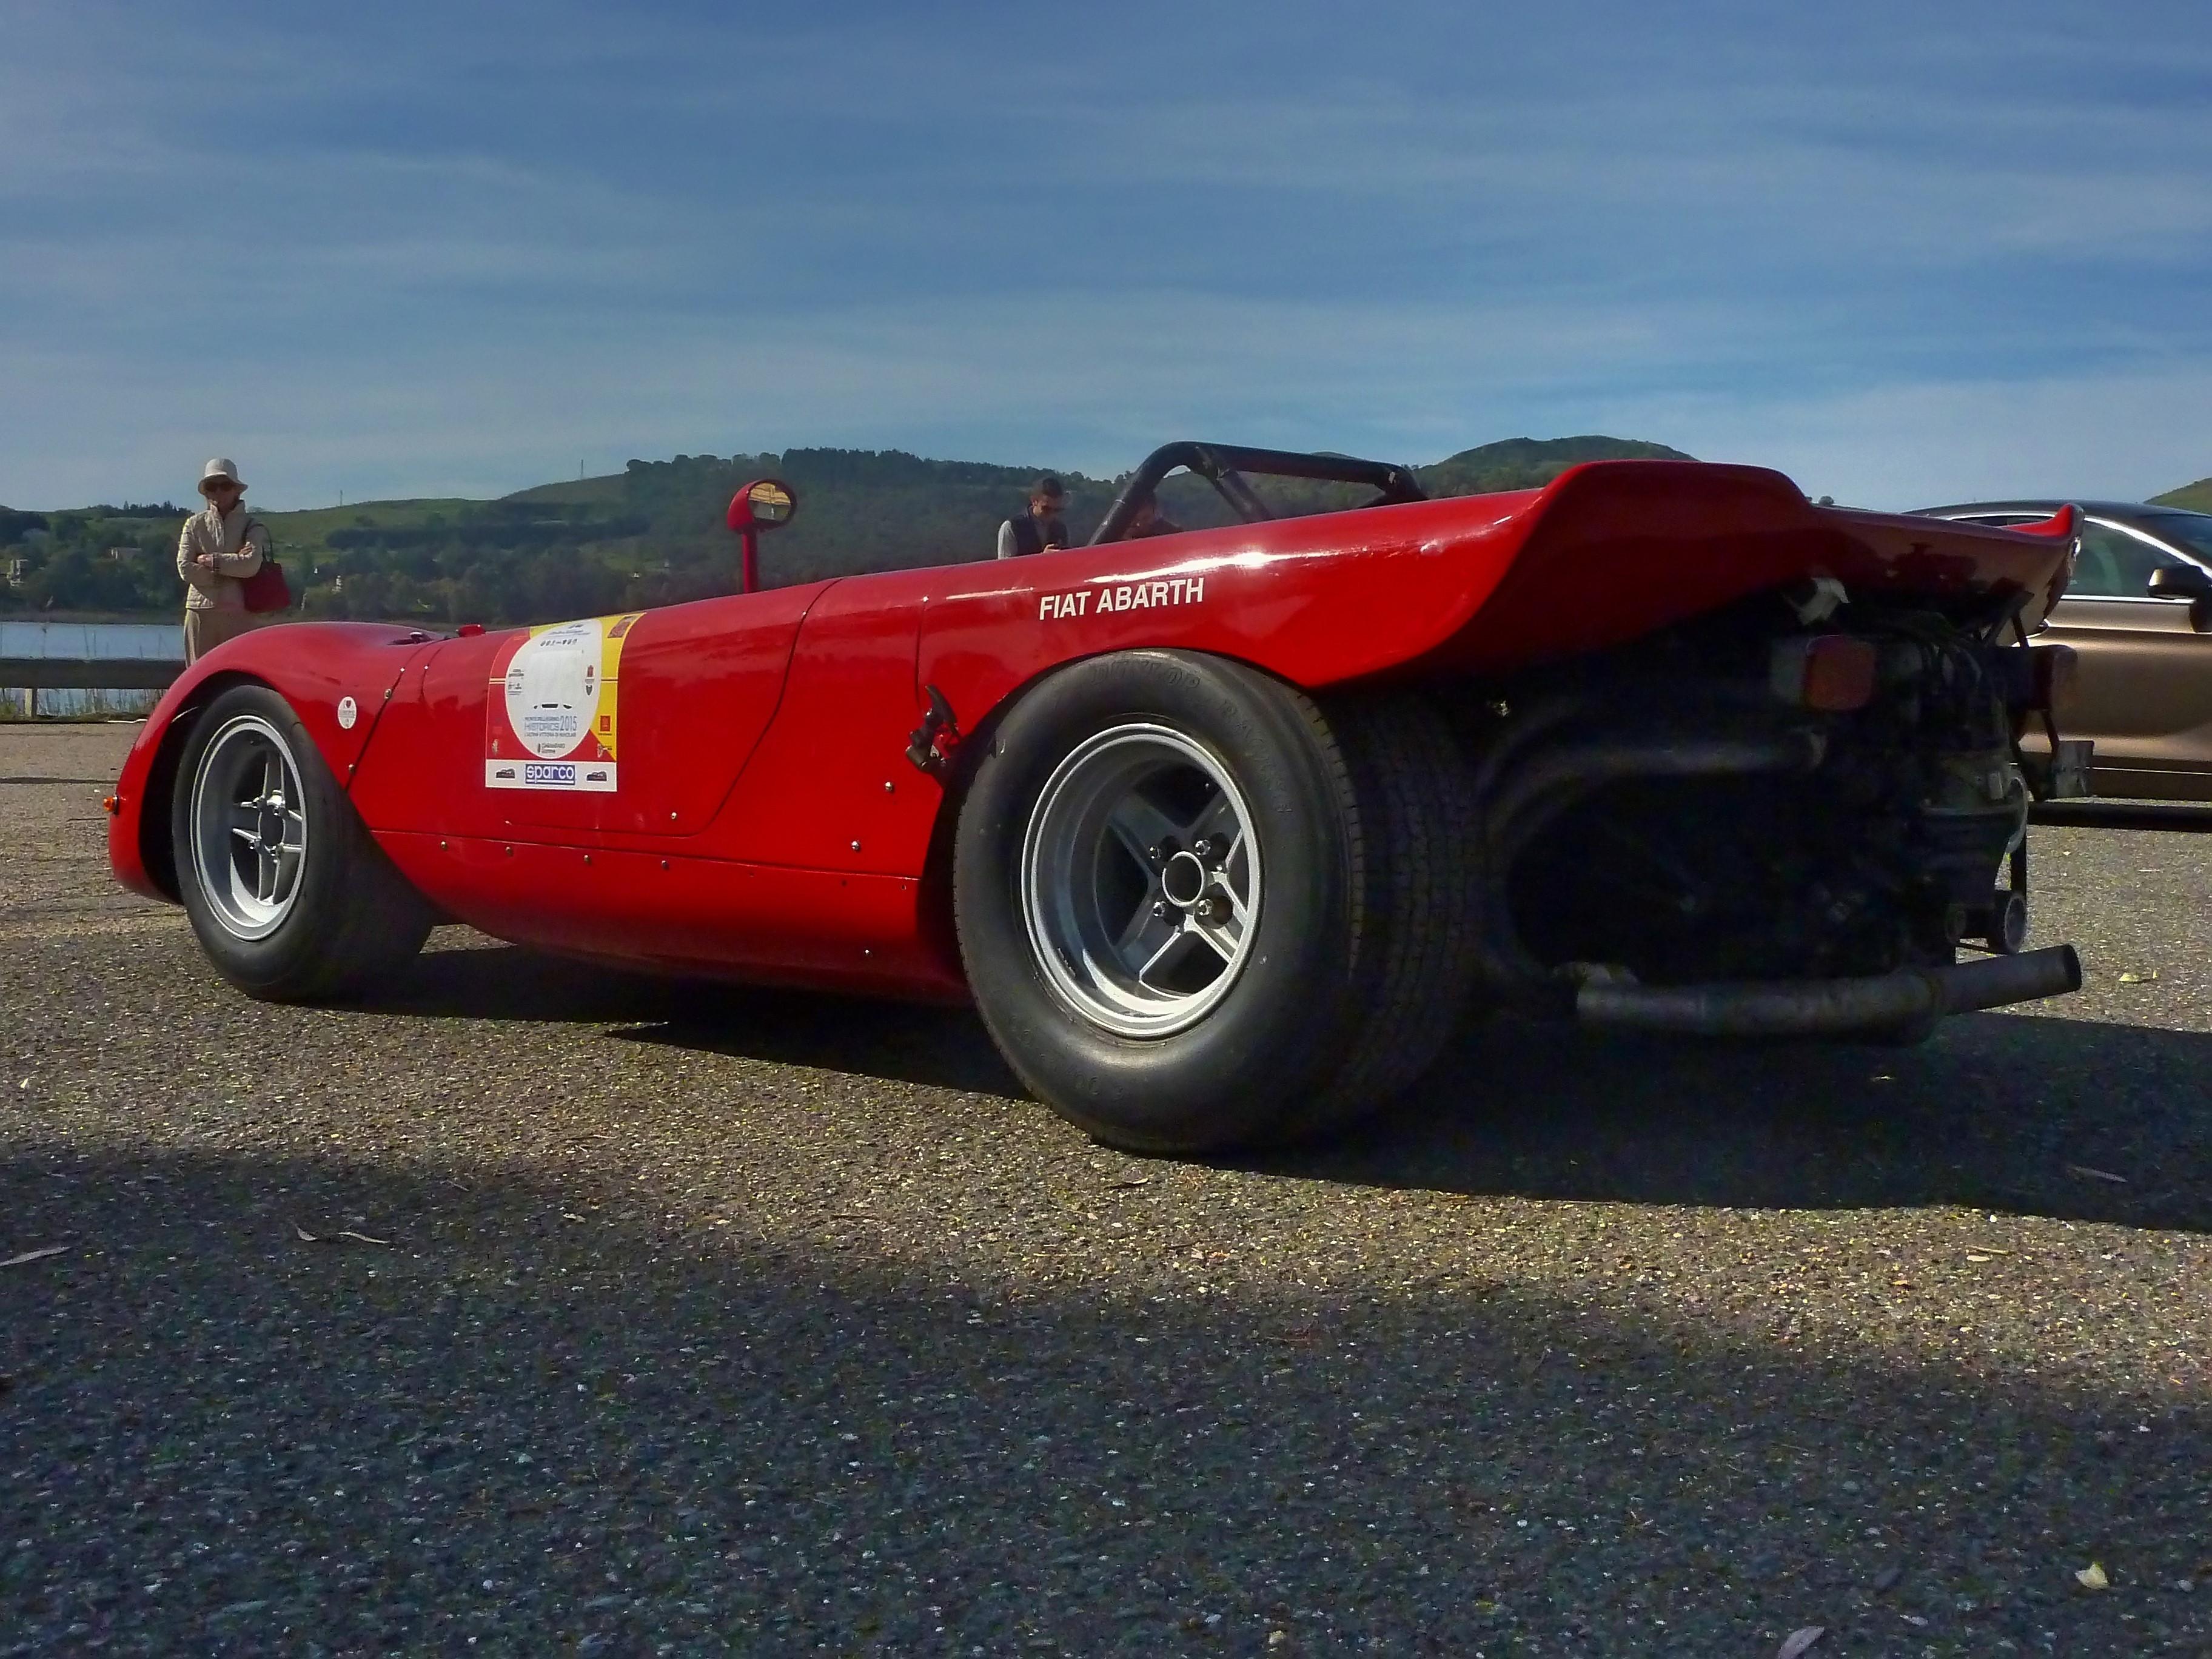 1971 Abarth 1300 SE 018 Biposto Cuneo (8)